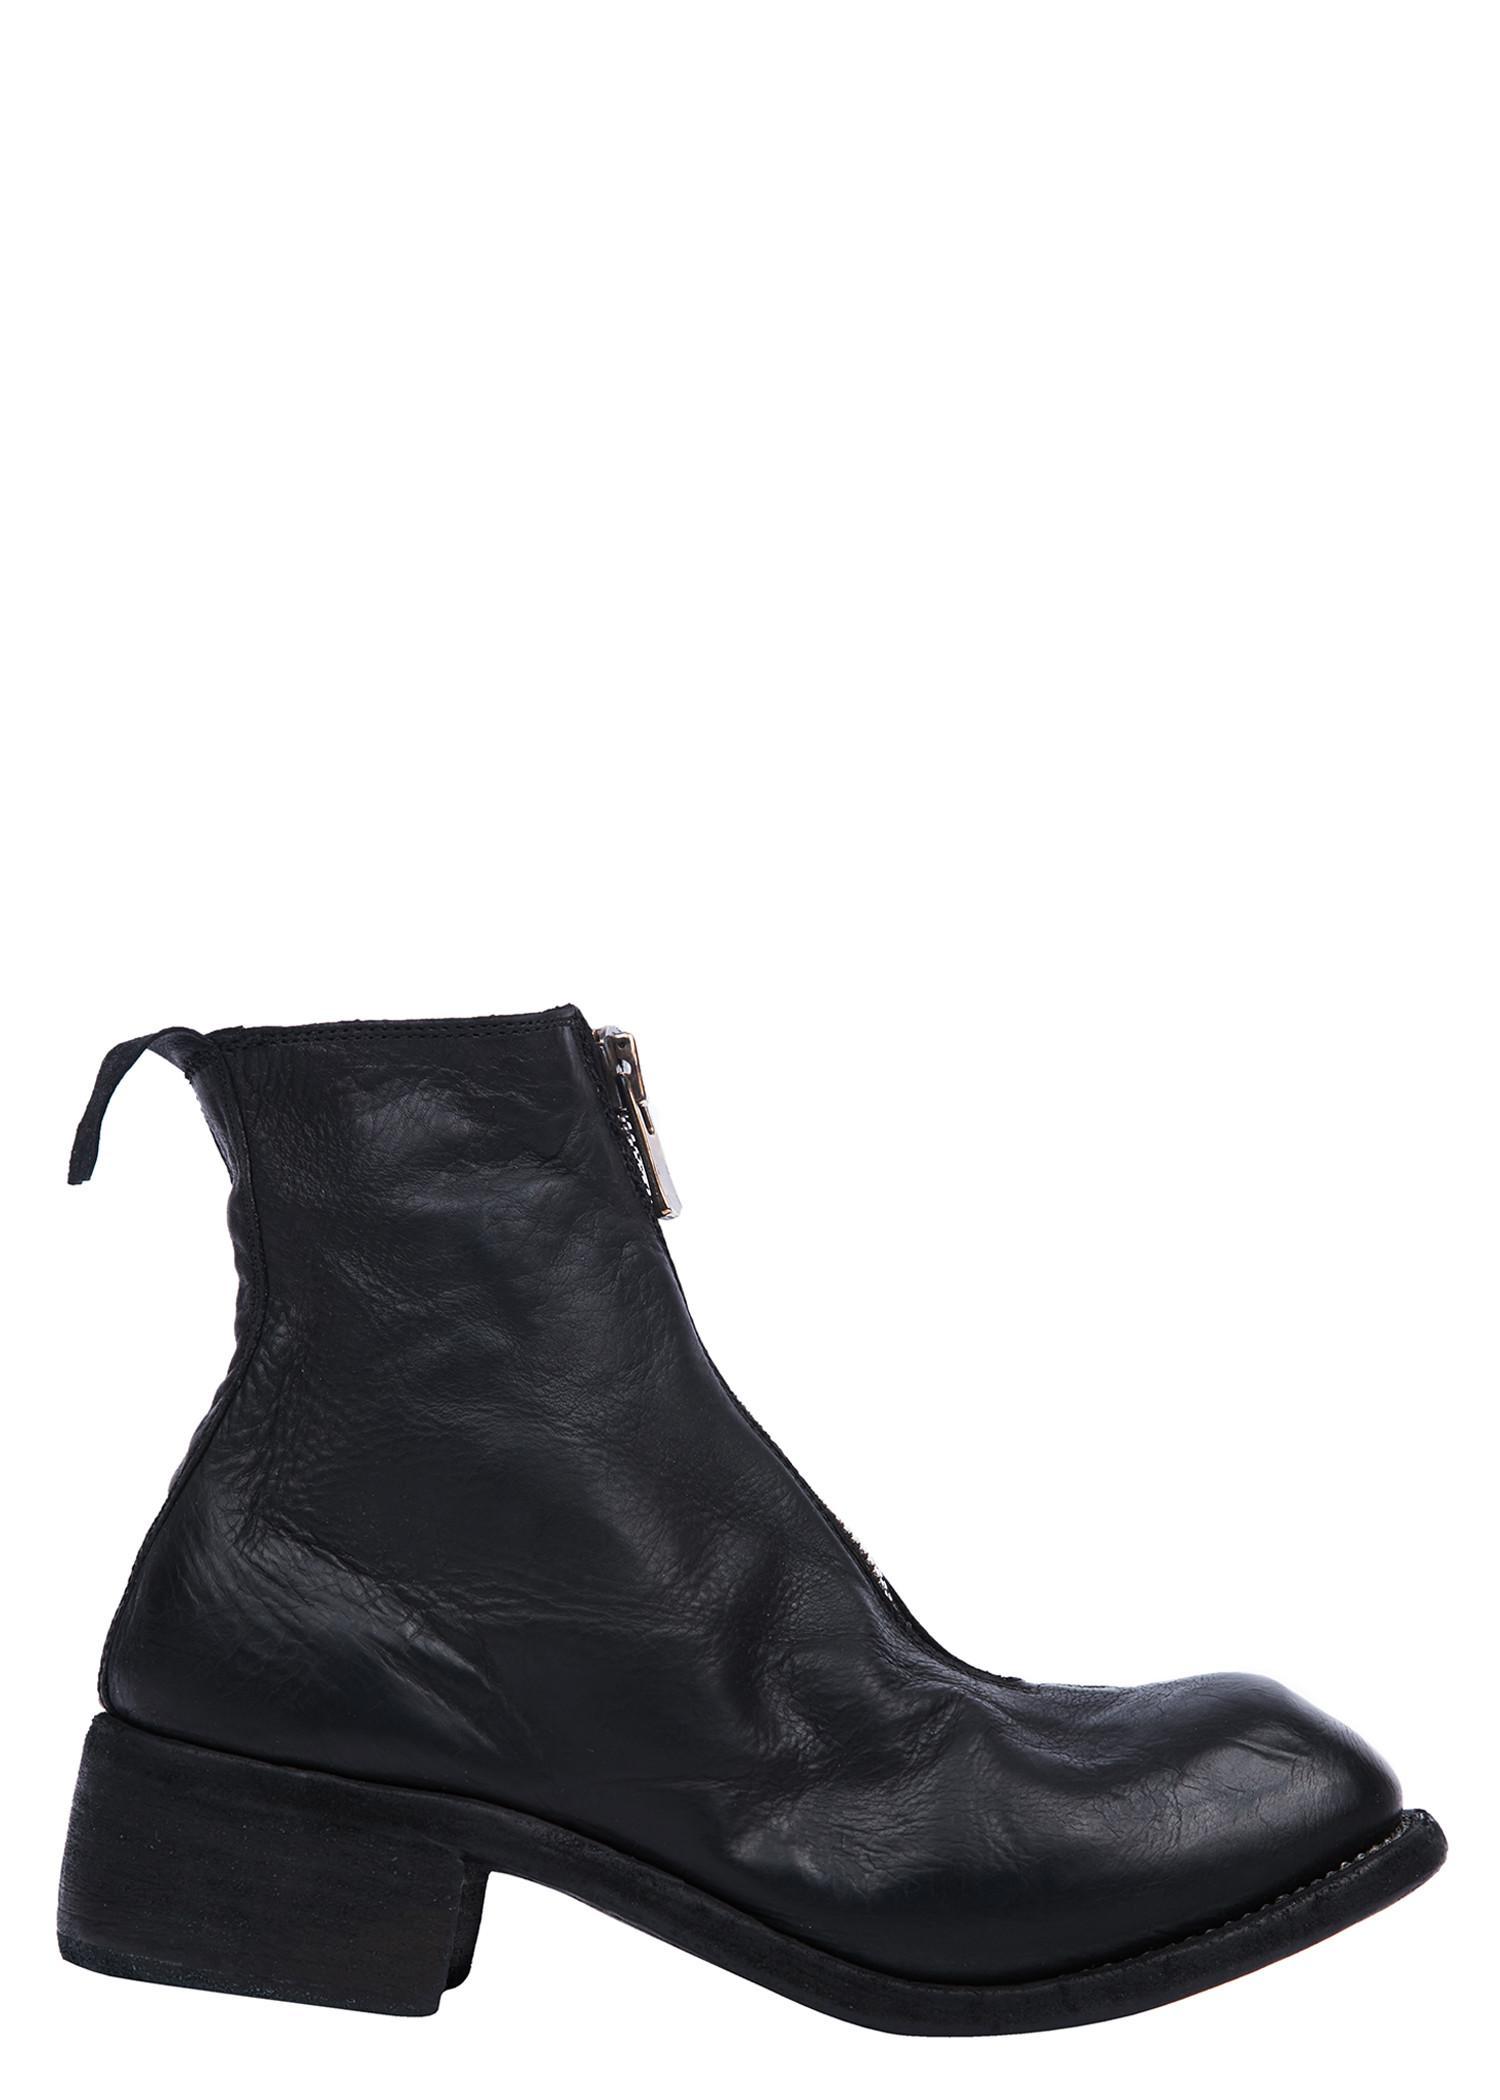 Guidi Baby Calf Full Grain Orthopaedic Front Zip Boots In Black